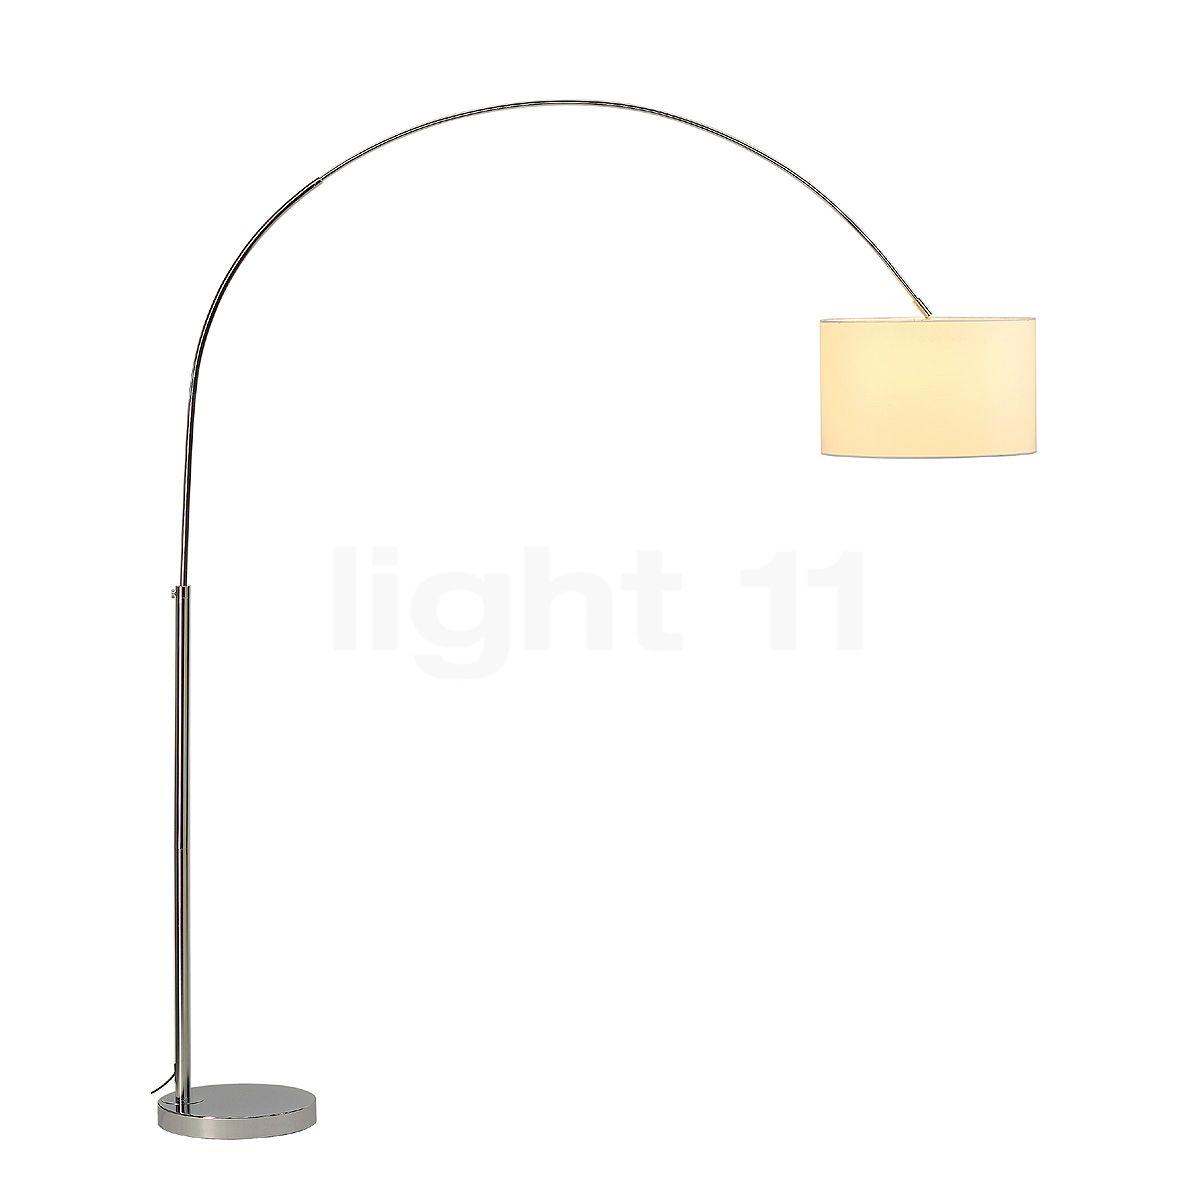 slv soprana bow sl 1 lampe arc en vente sur. Black Bedroom Furniture Sets. Home Design Ideas